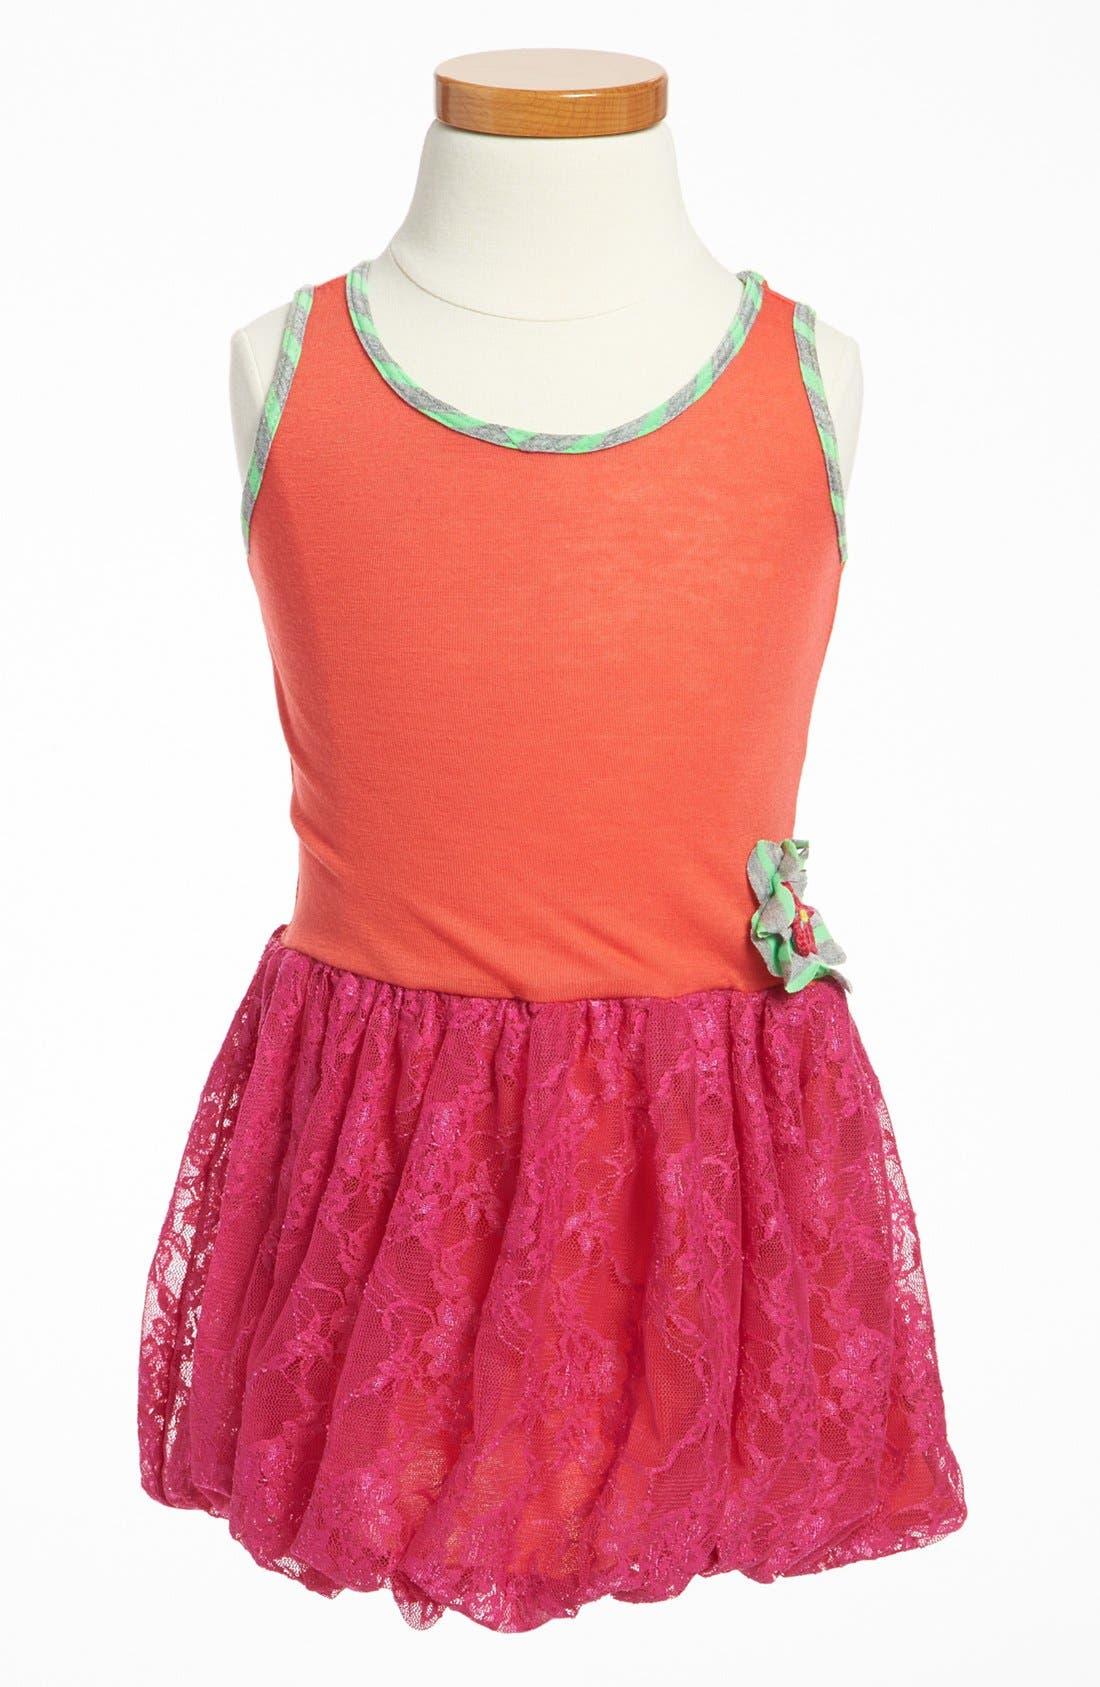 Alternate Image 1 Selected - Twirls & Twigs Bubble Skirt Dress (Toddler)